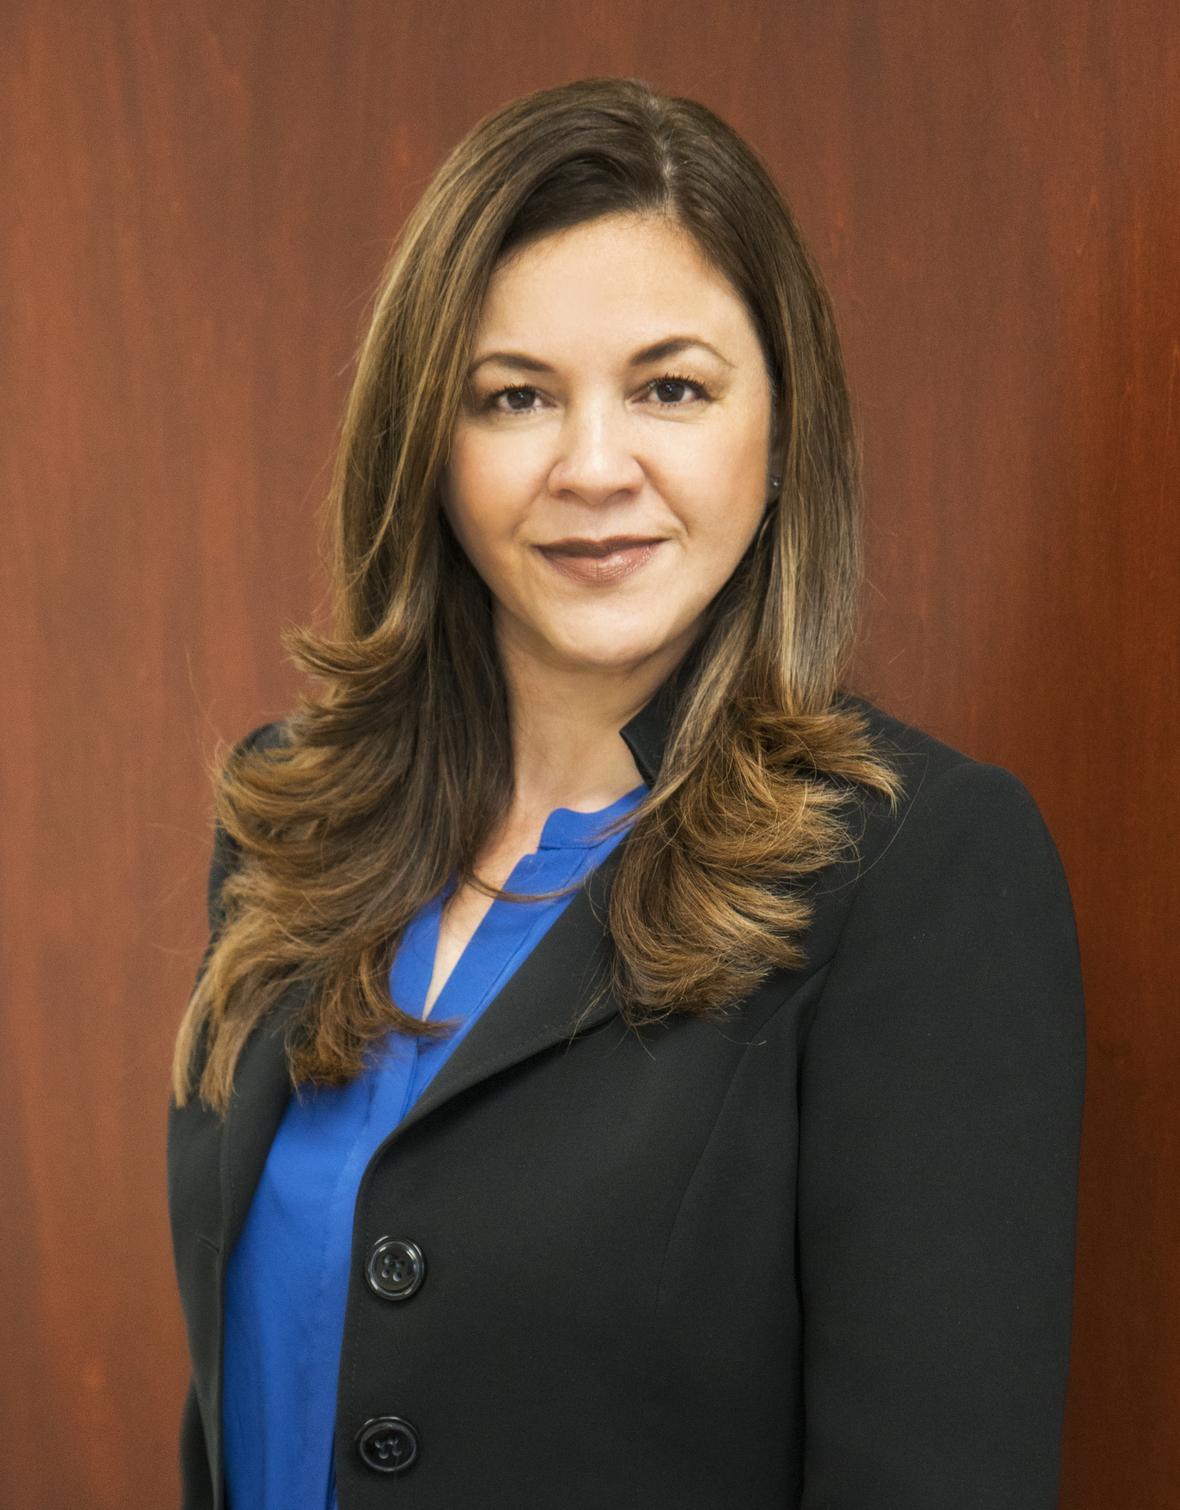 Carolina Patino